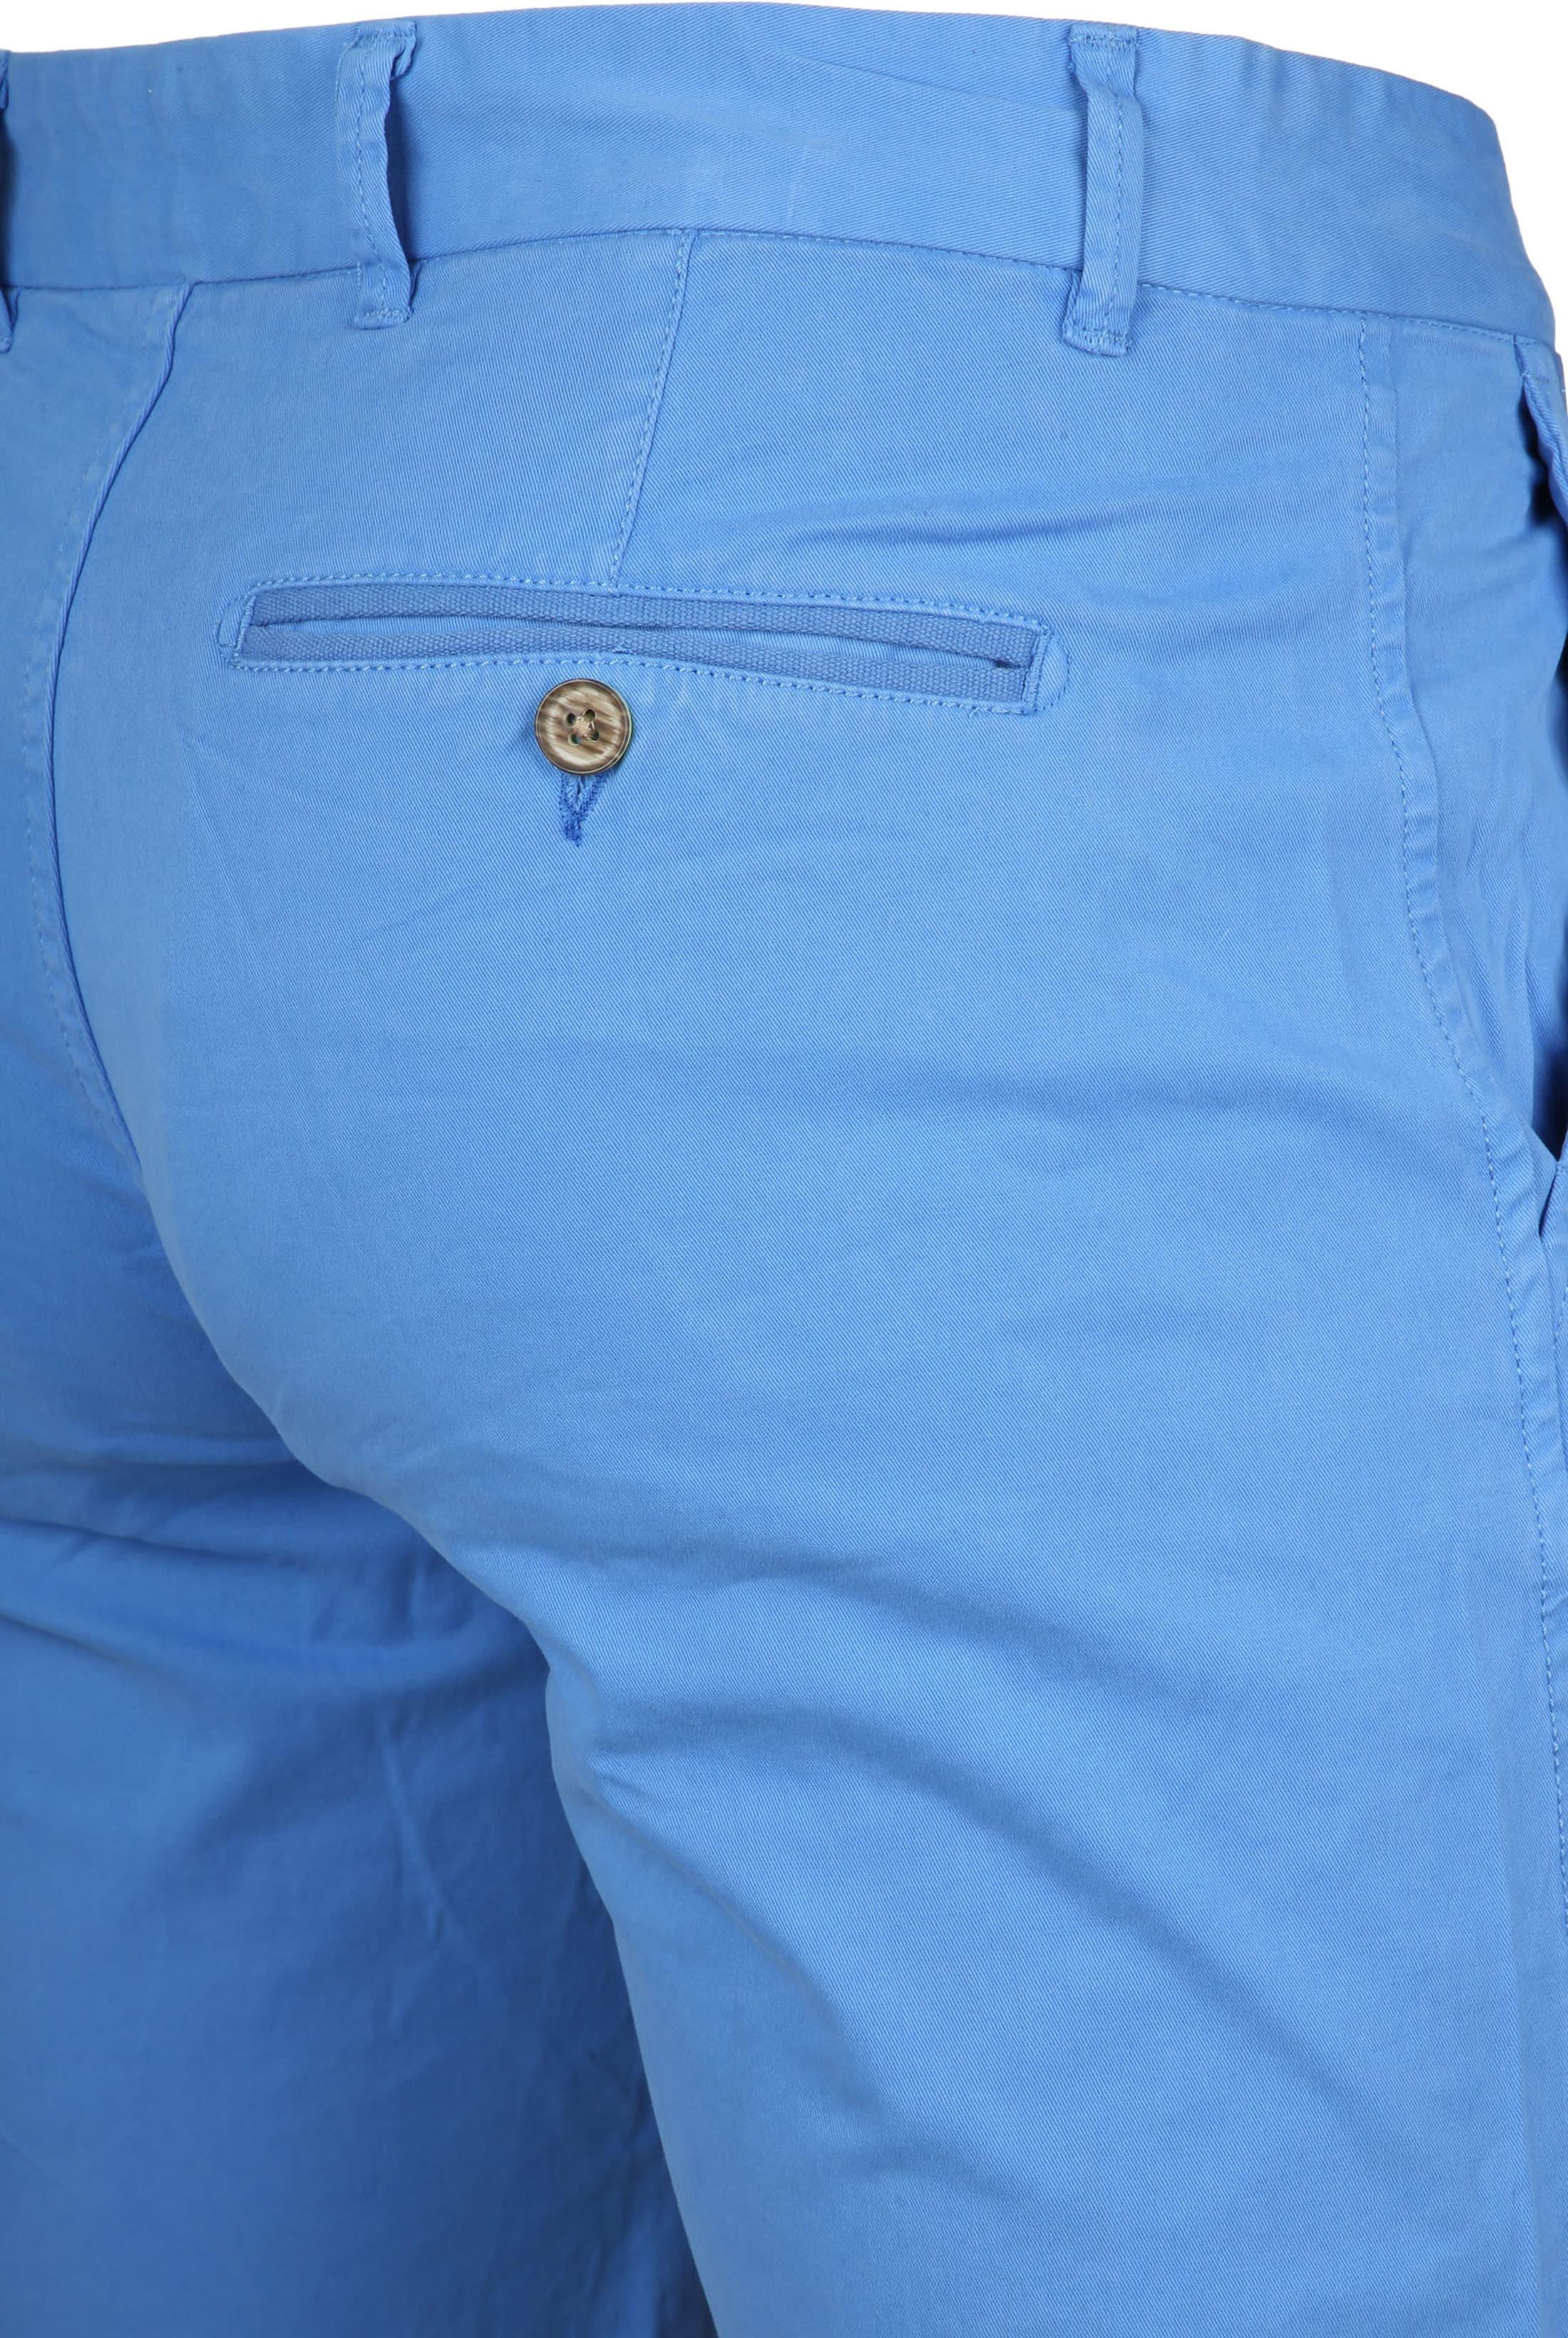 Suitable Short Arend Blauw foto 1